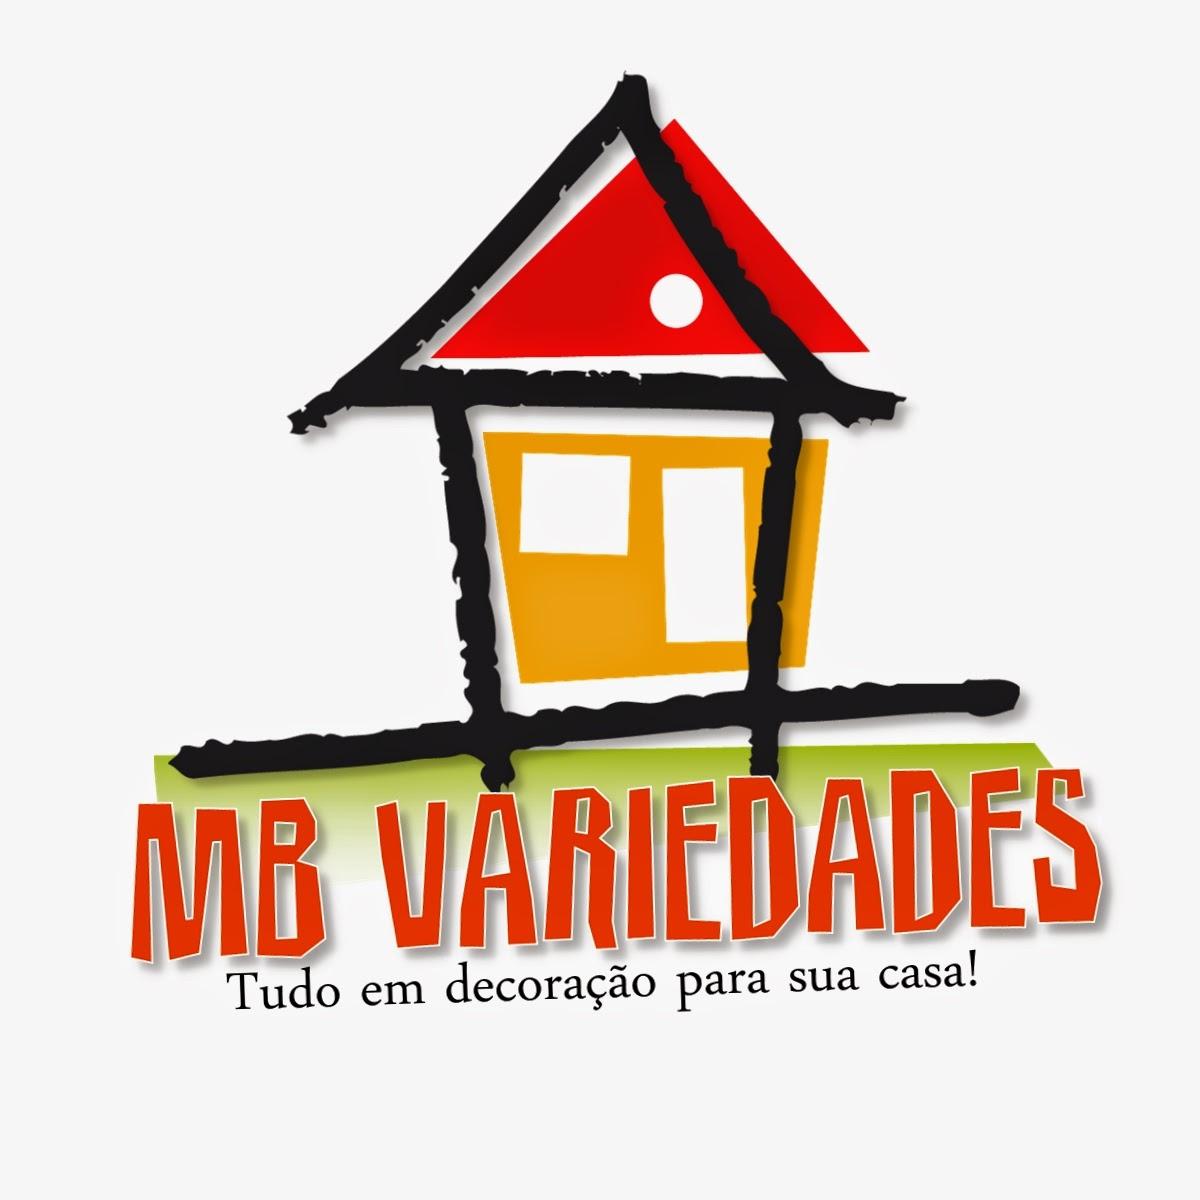 MB VARIEDADES